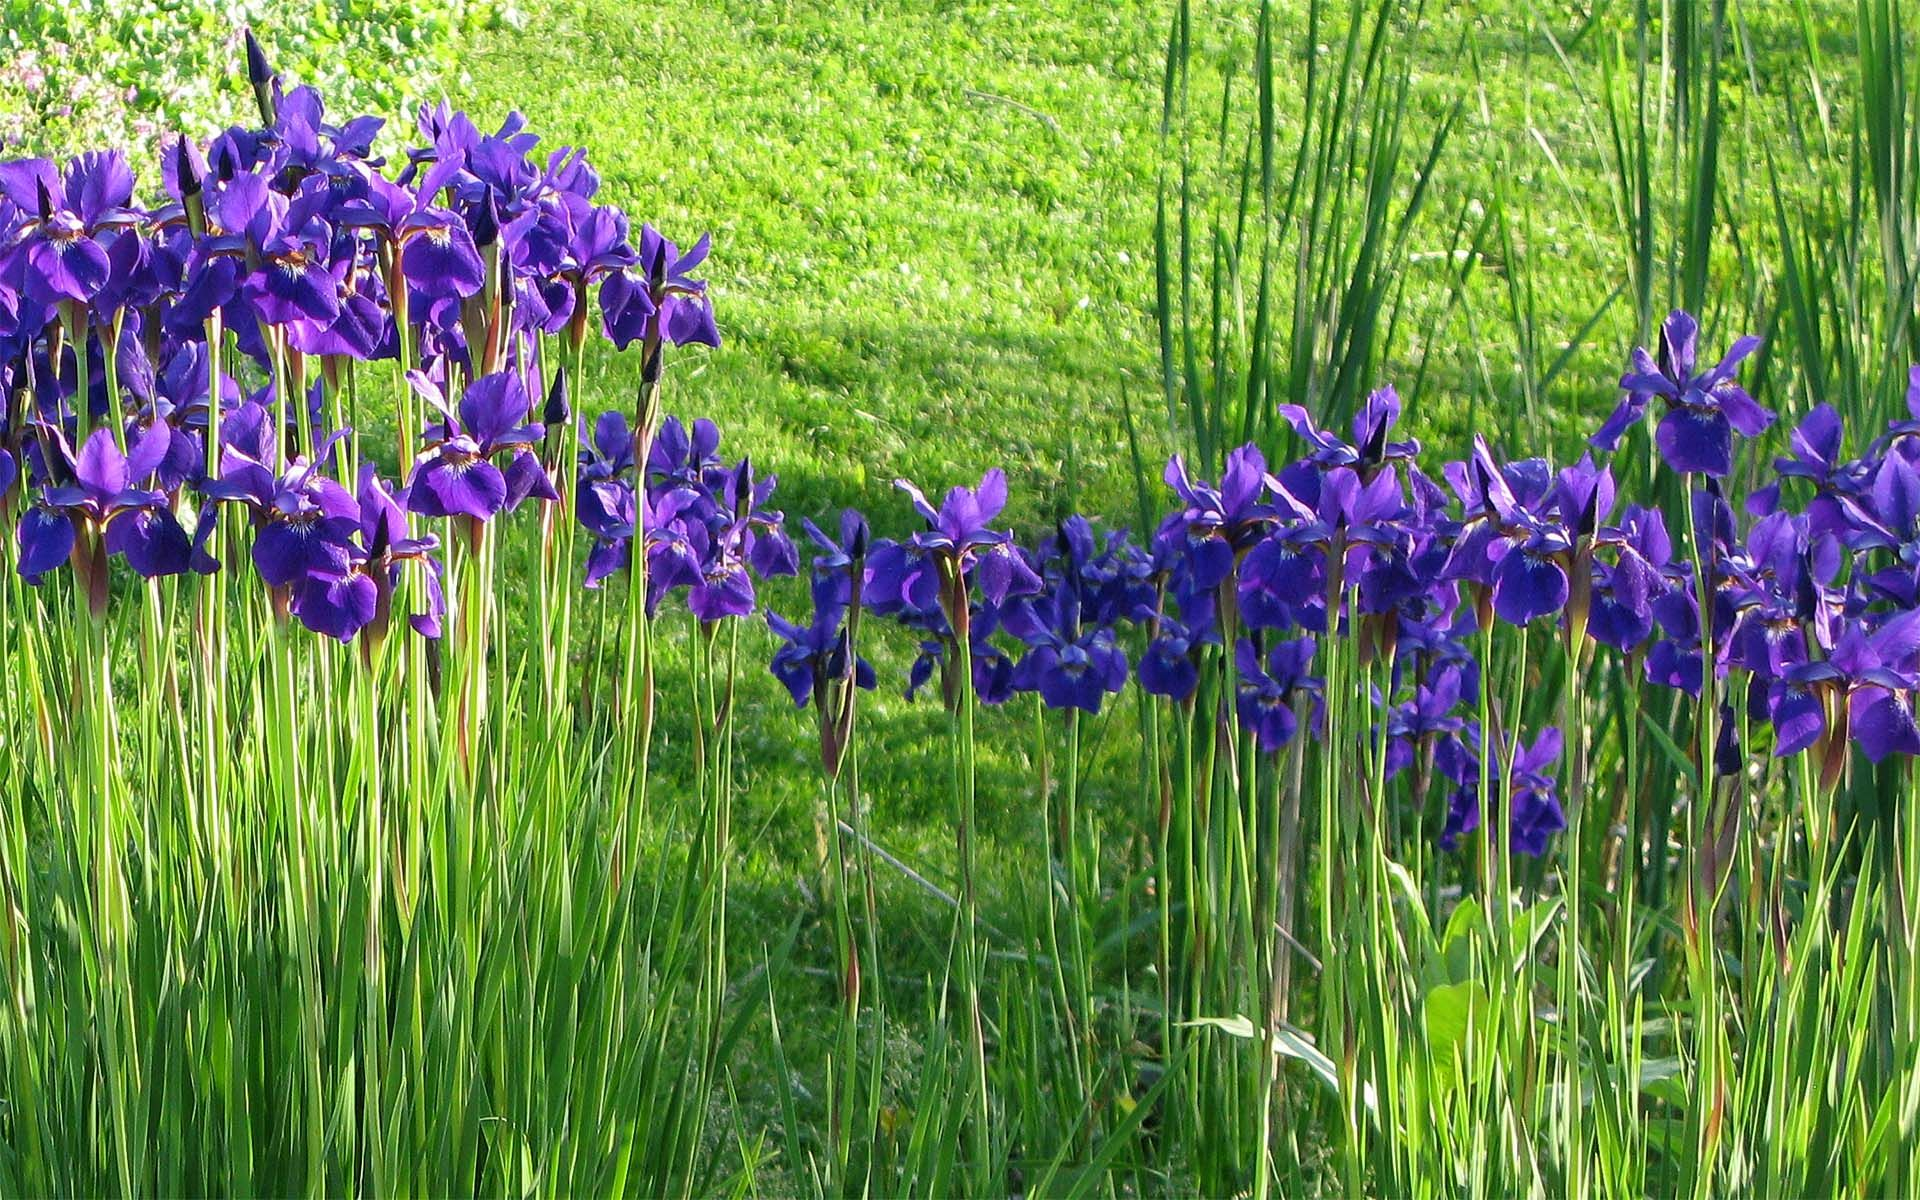 Mini floating iris flowers google search design gardens mini floating iris flowers google search izmirmasajfo Image collections